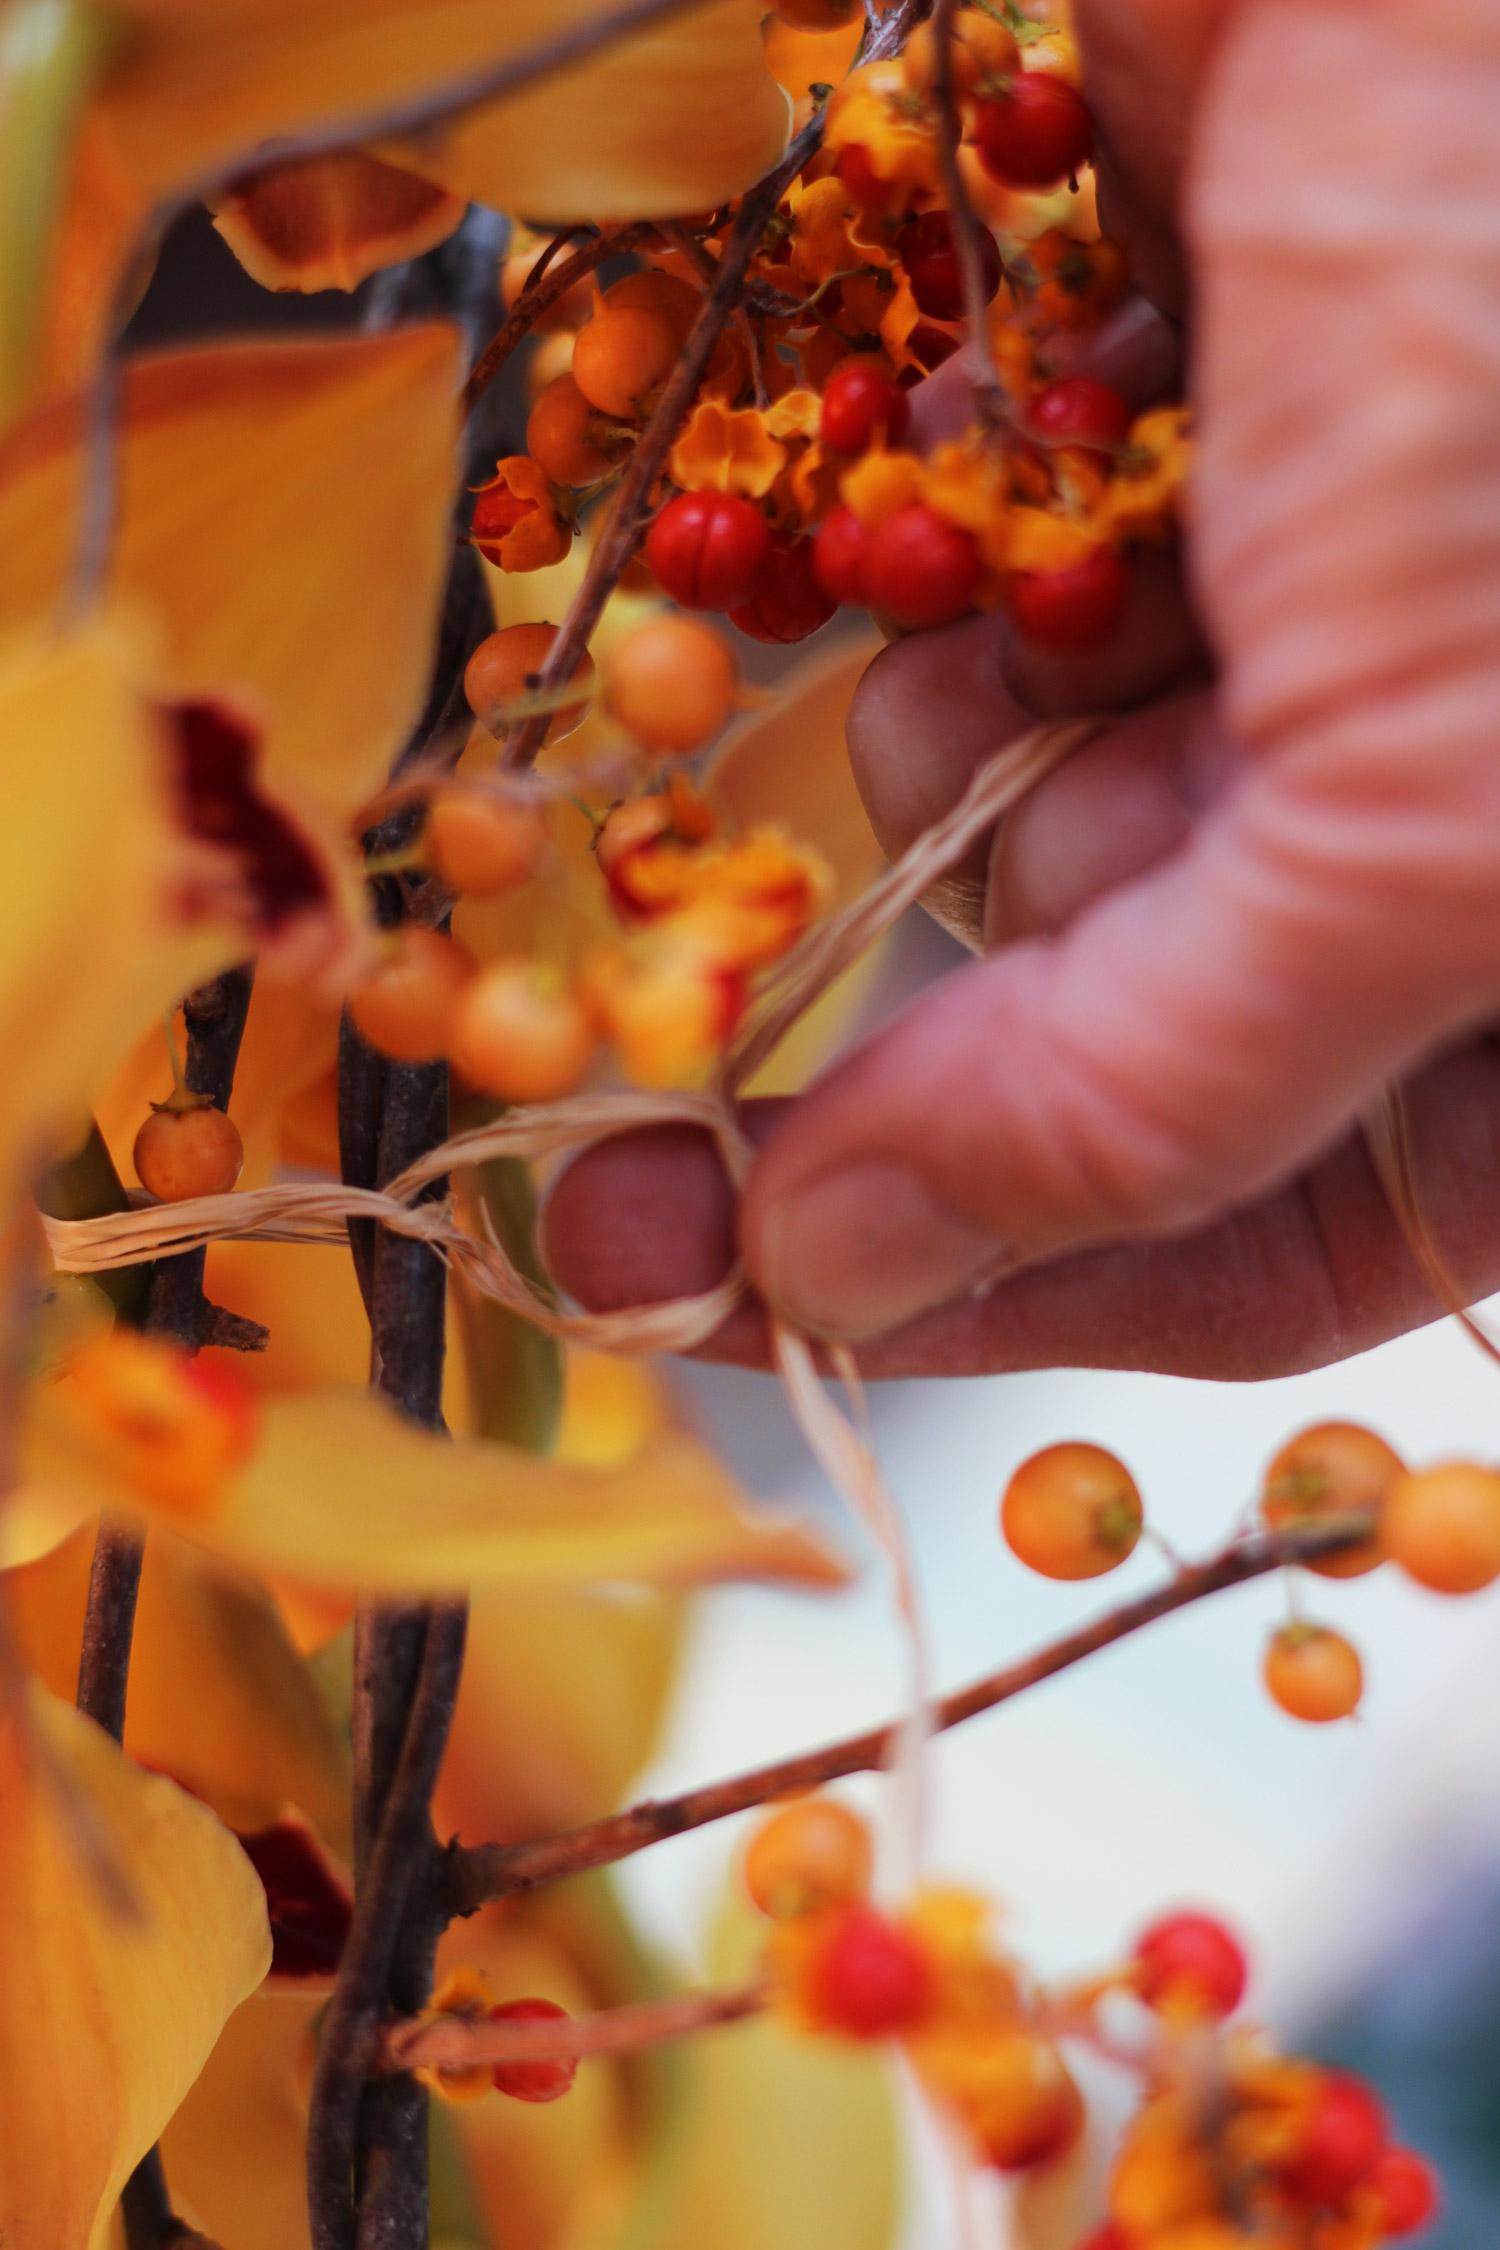 Tie orchid to vine with raffia. Make 2 knots. Trim.